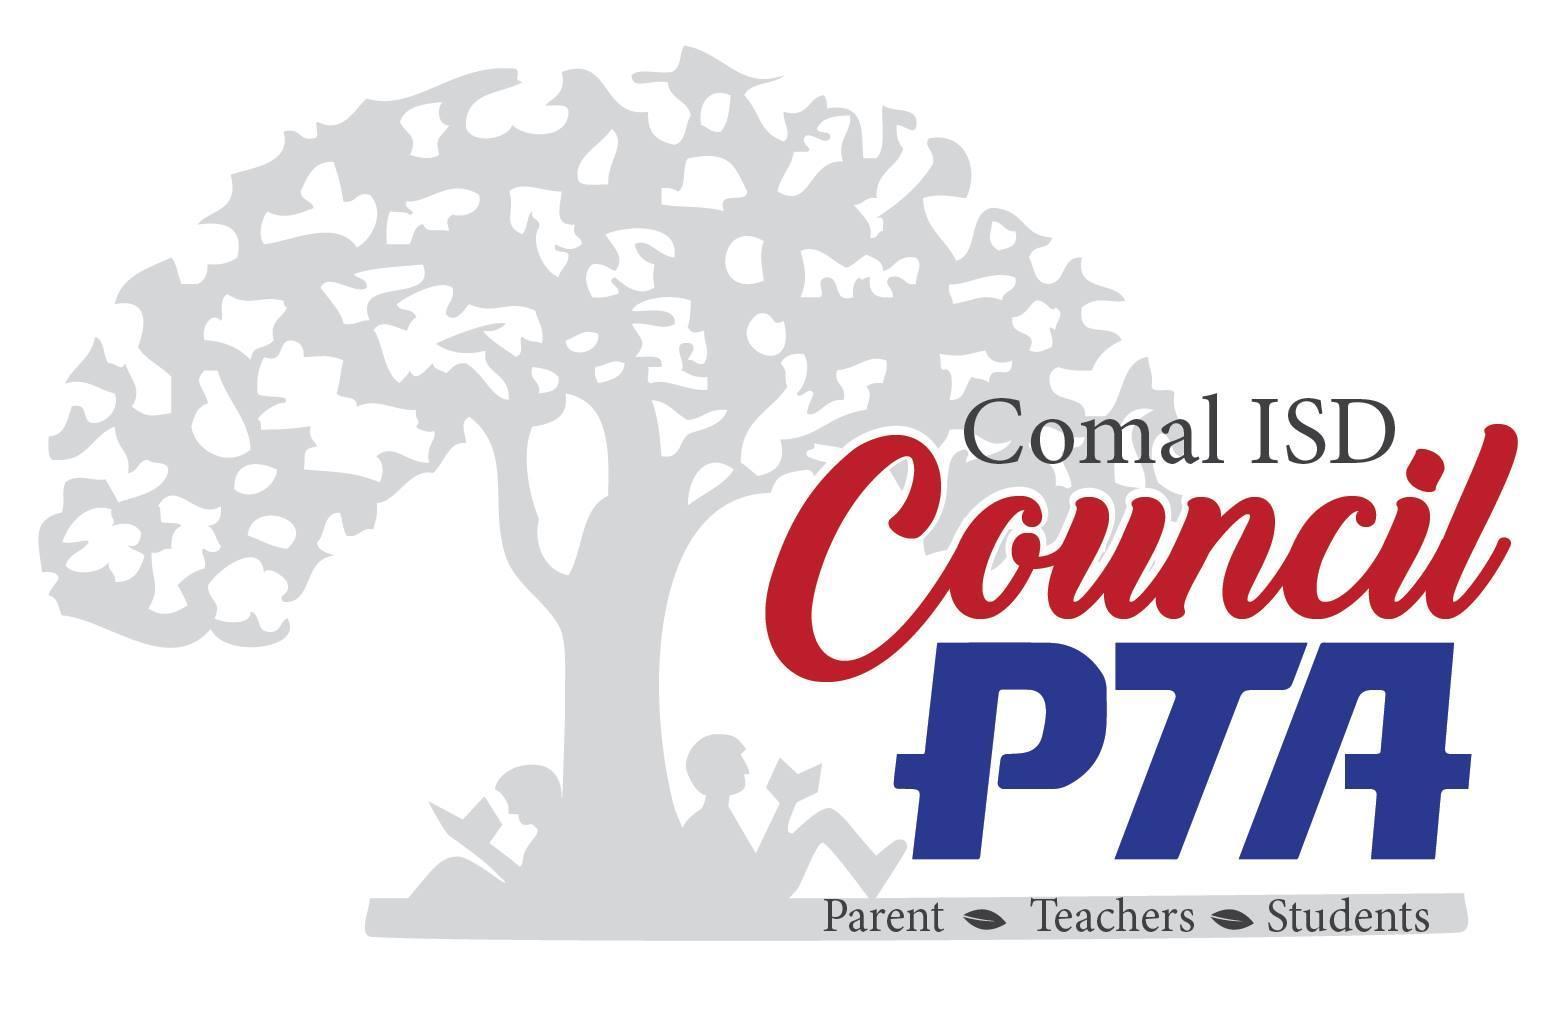 PTA - Community - Comal Independent School District